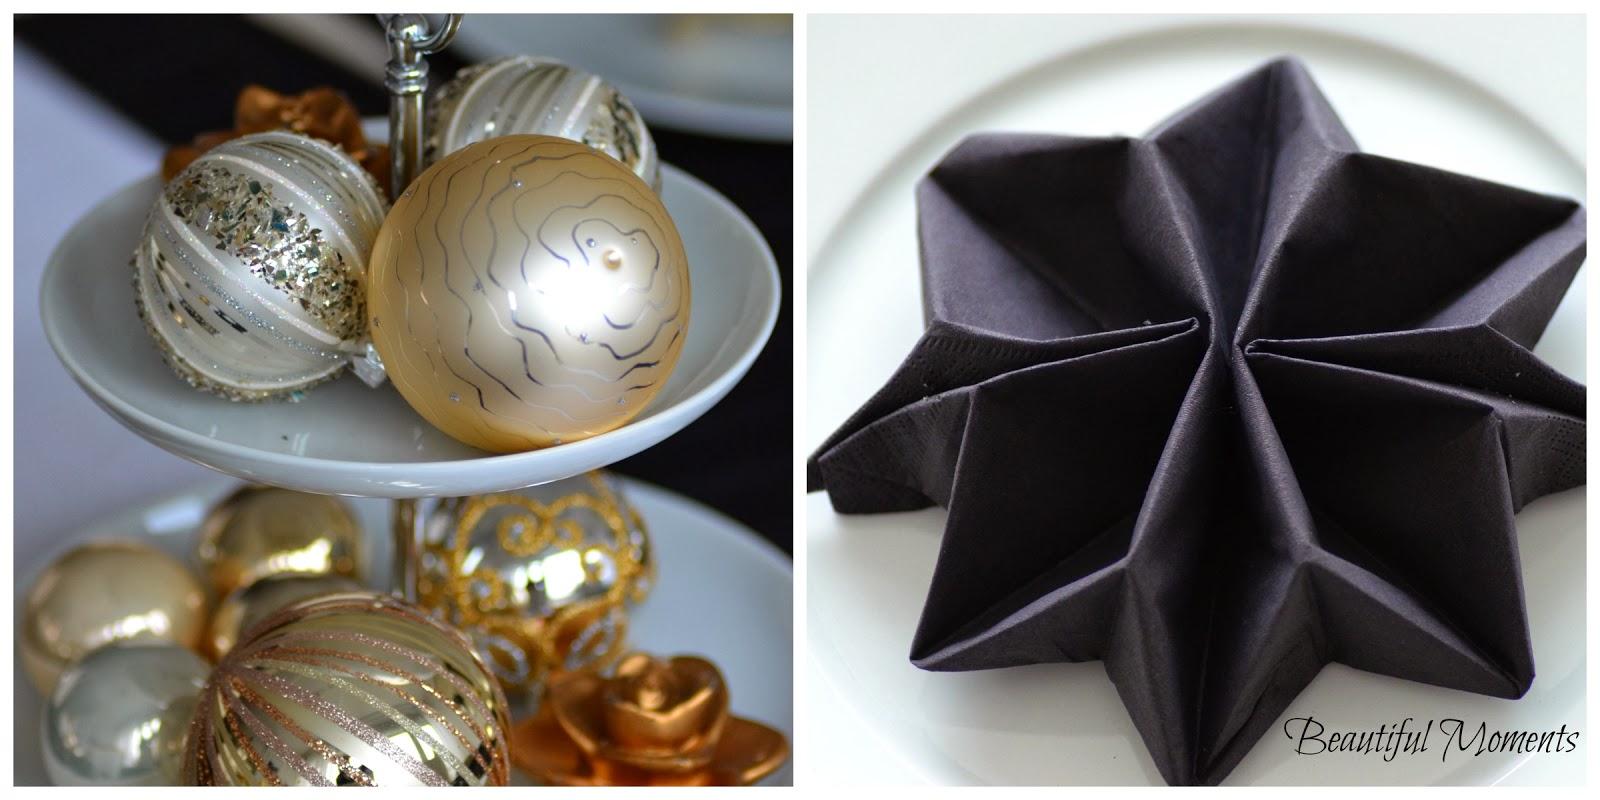 beautiful moments tischdekoideen f r weihnachten in. Black Bedroom Furniture Sets. Home Design Ideas